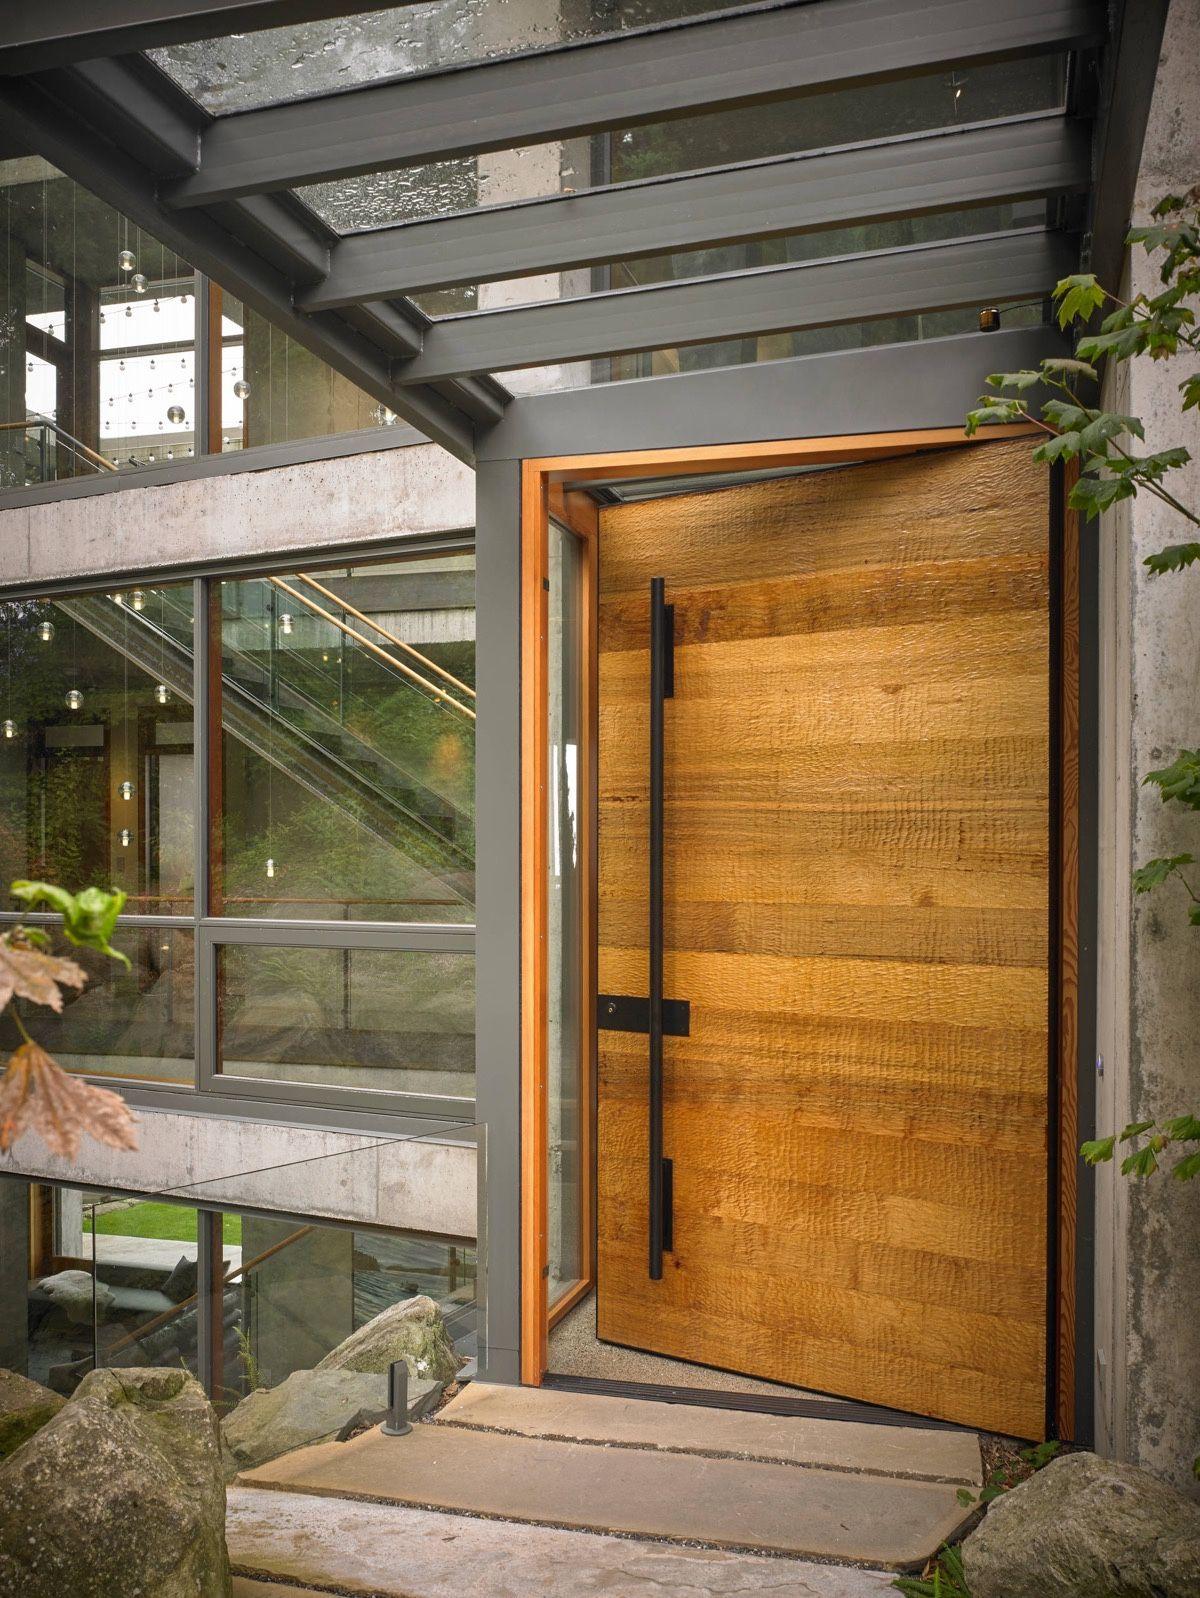 15 portes d 39 entr e modernes d couvrir entr e for Porte maison moderne